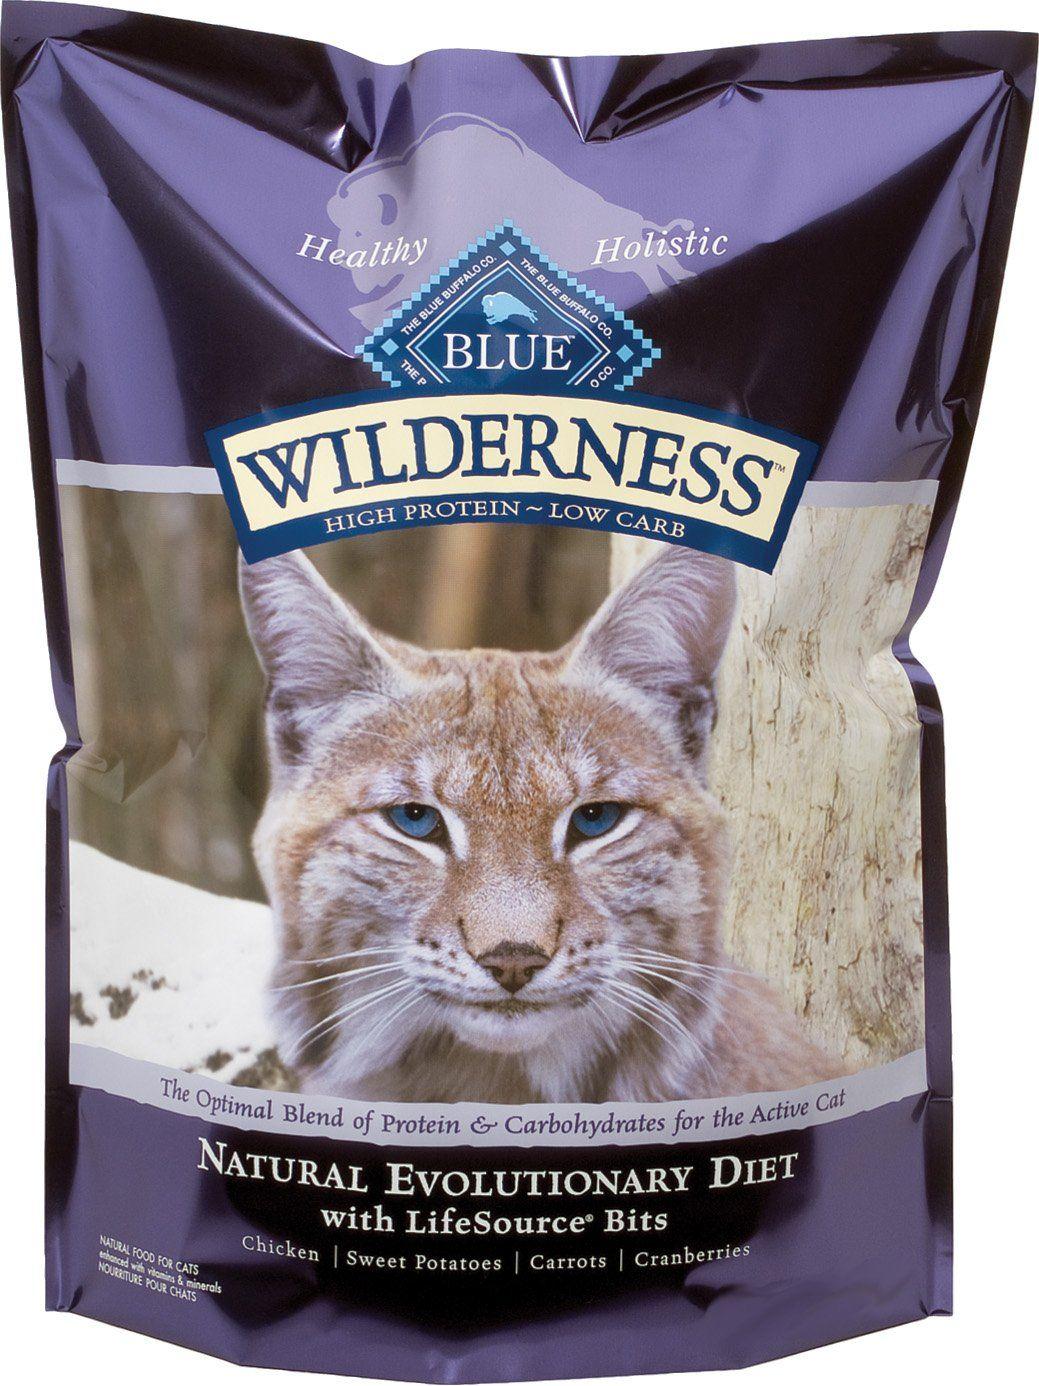 Blue buffalo wilderness grain free dry cat food chicken